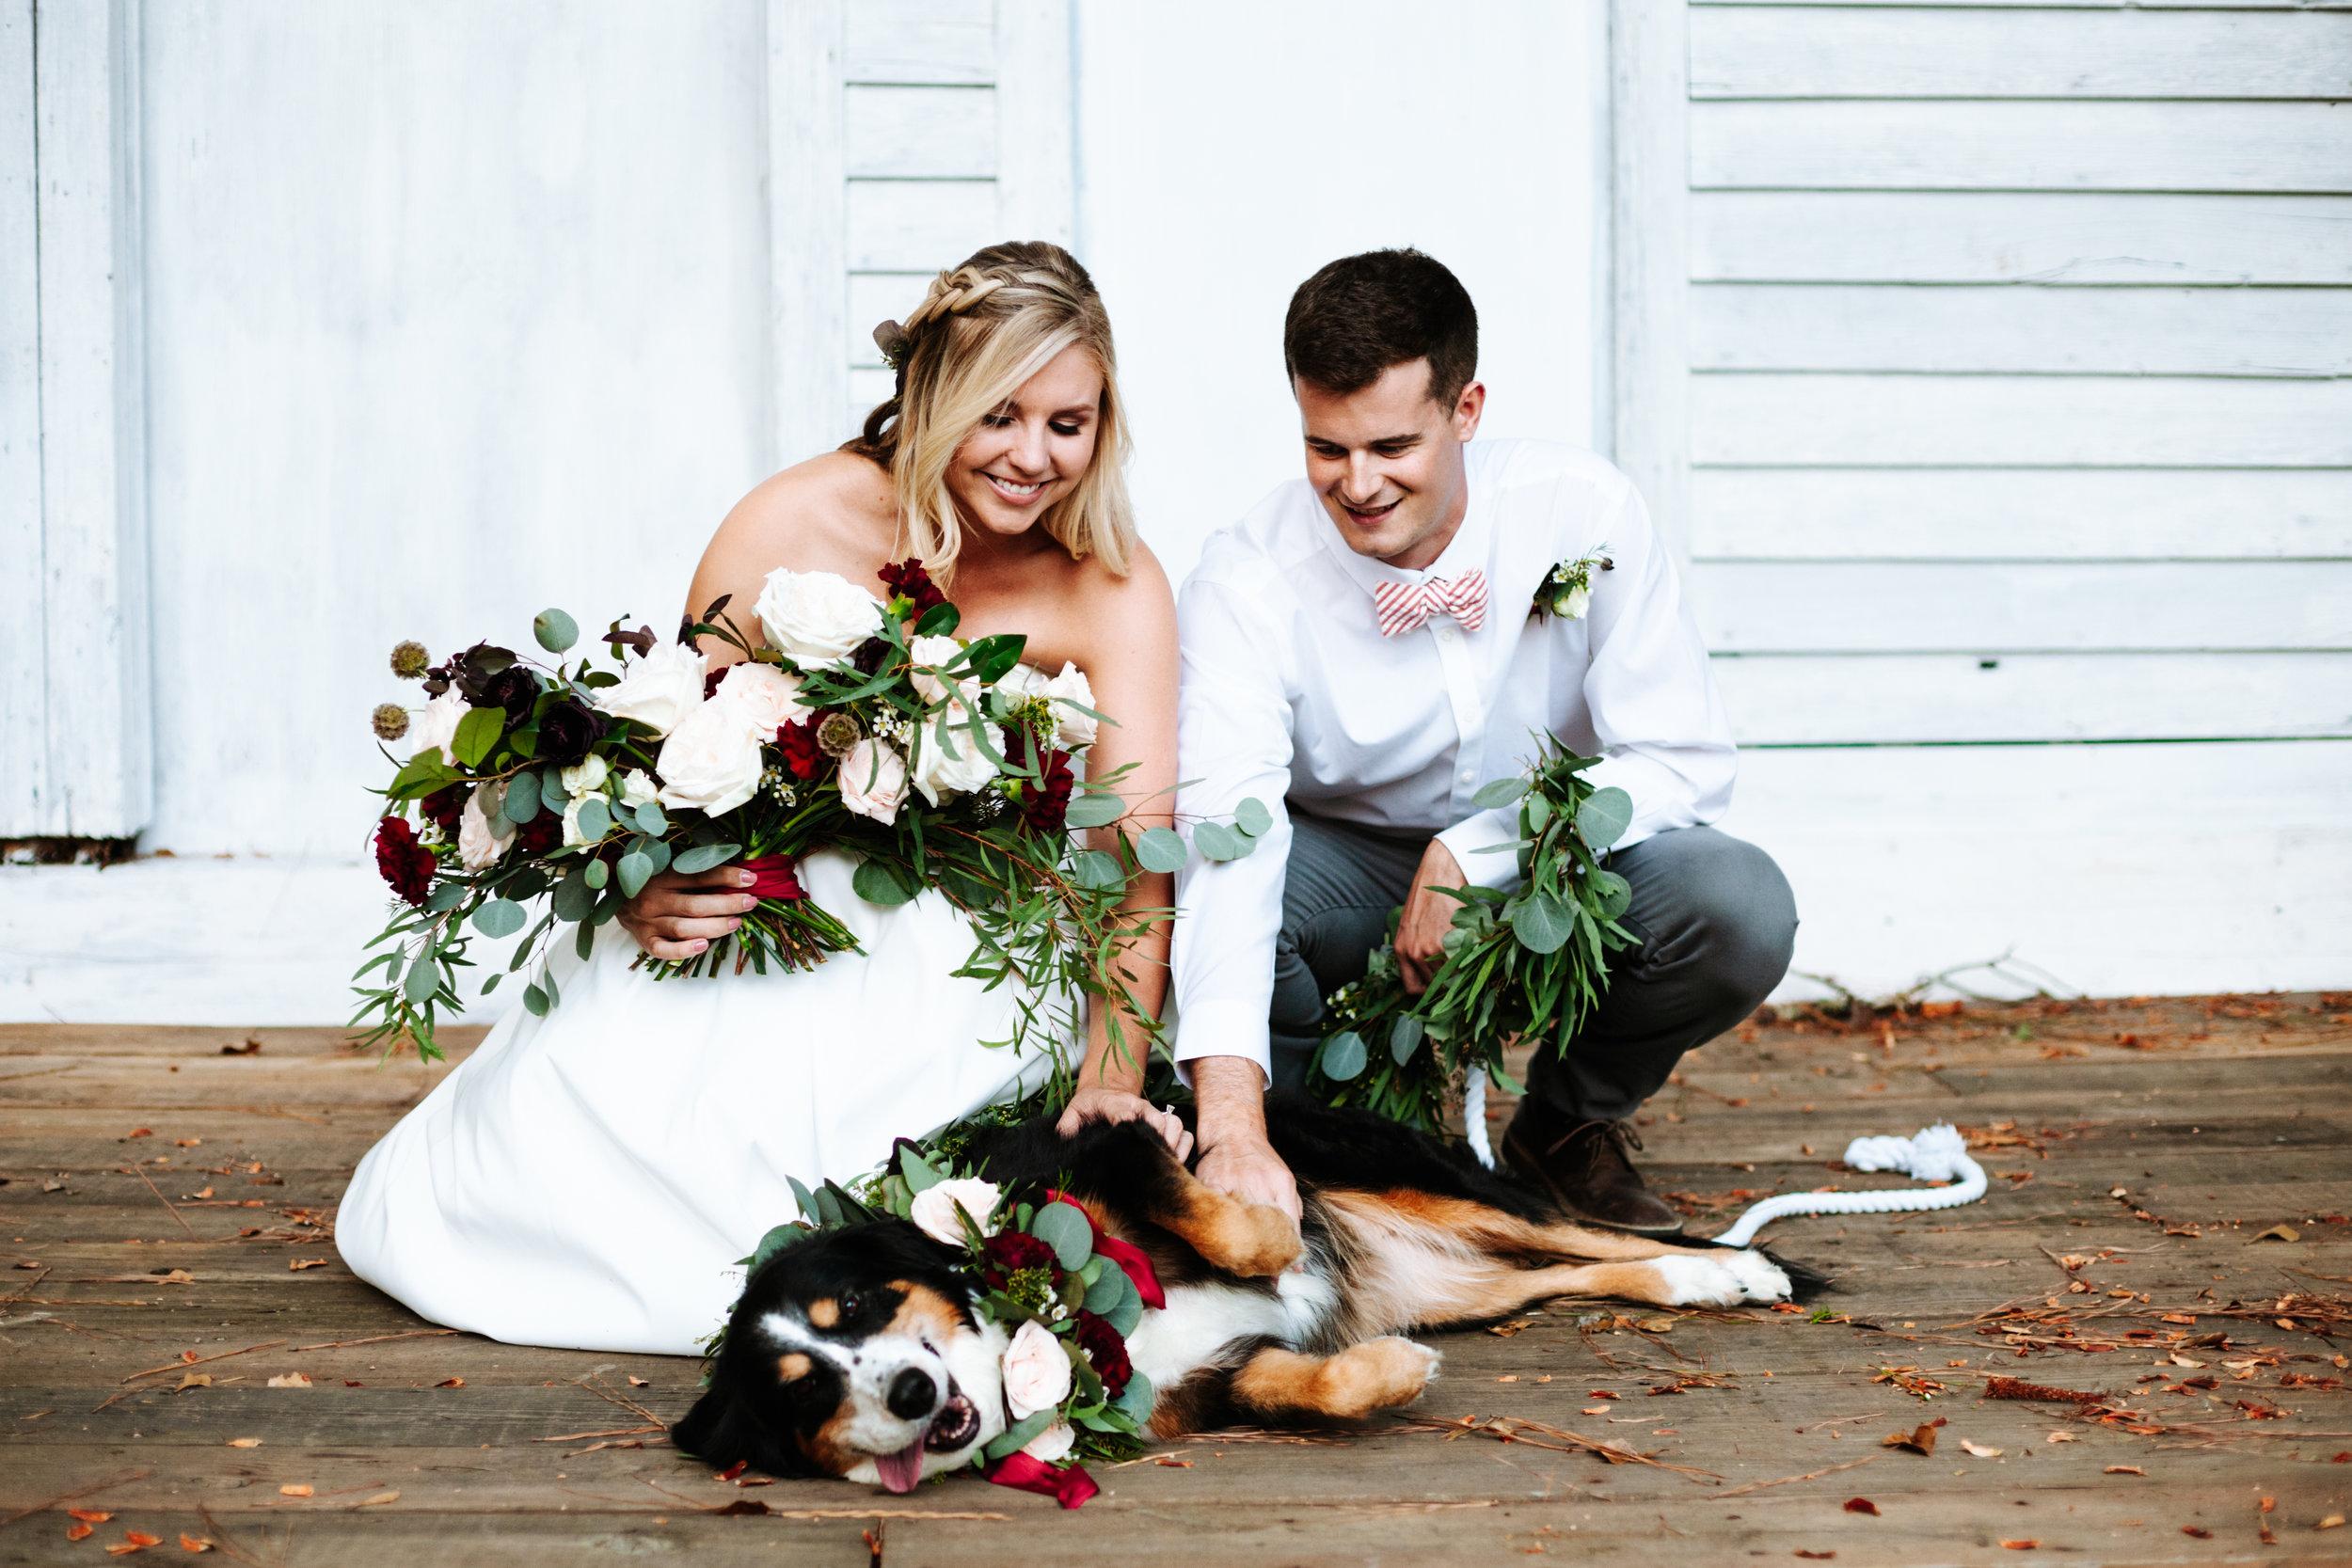 +Utah +Photographer +Utah Wedding Photographer +Utah Engagement Photographer +Salt Lake City Photographer -3397 (1).jpg